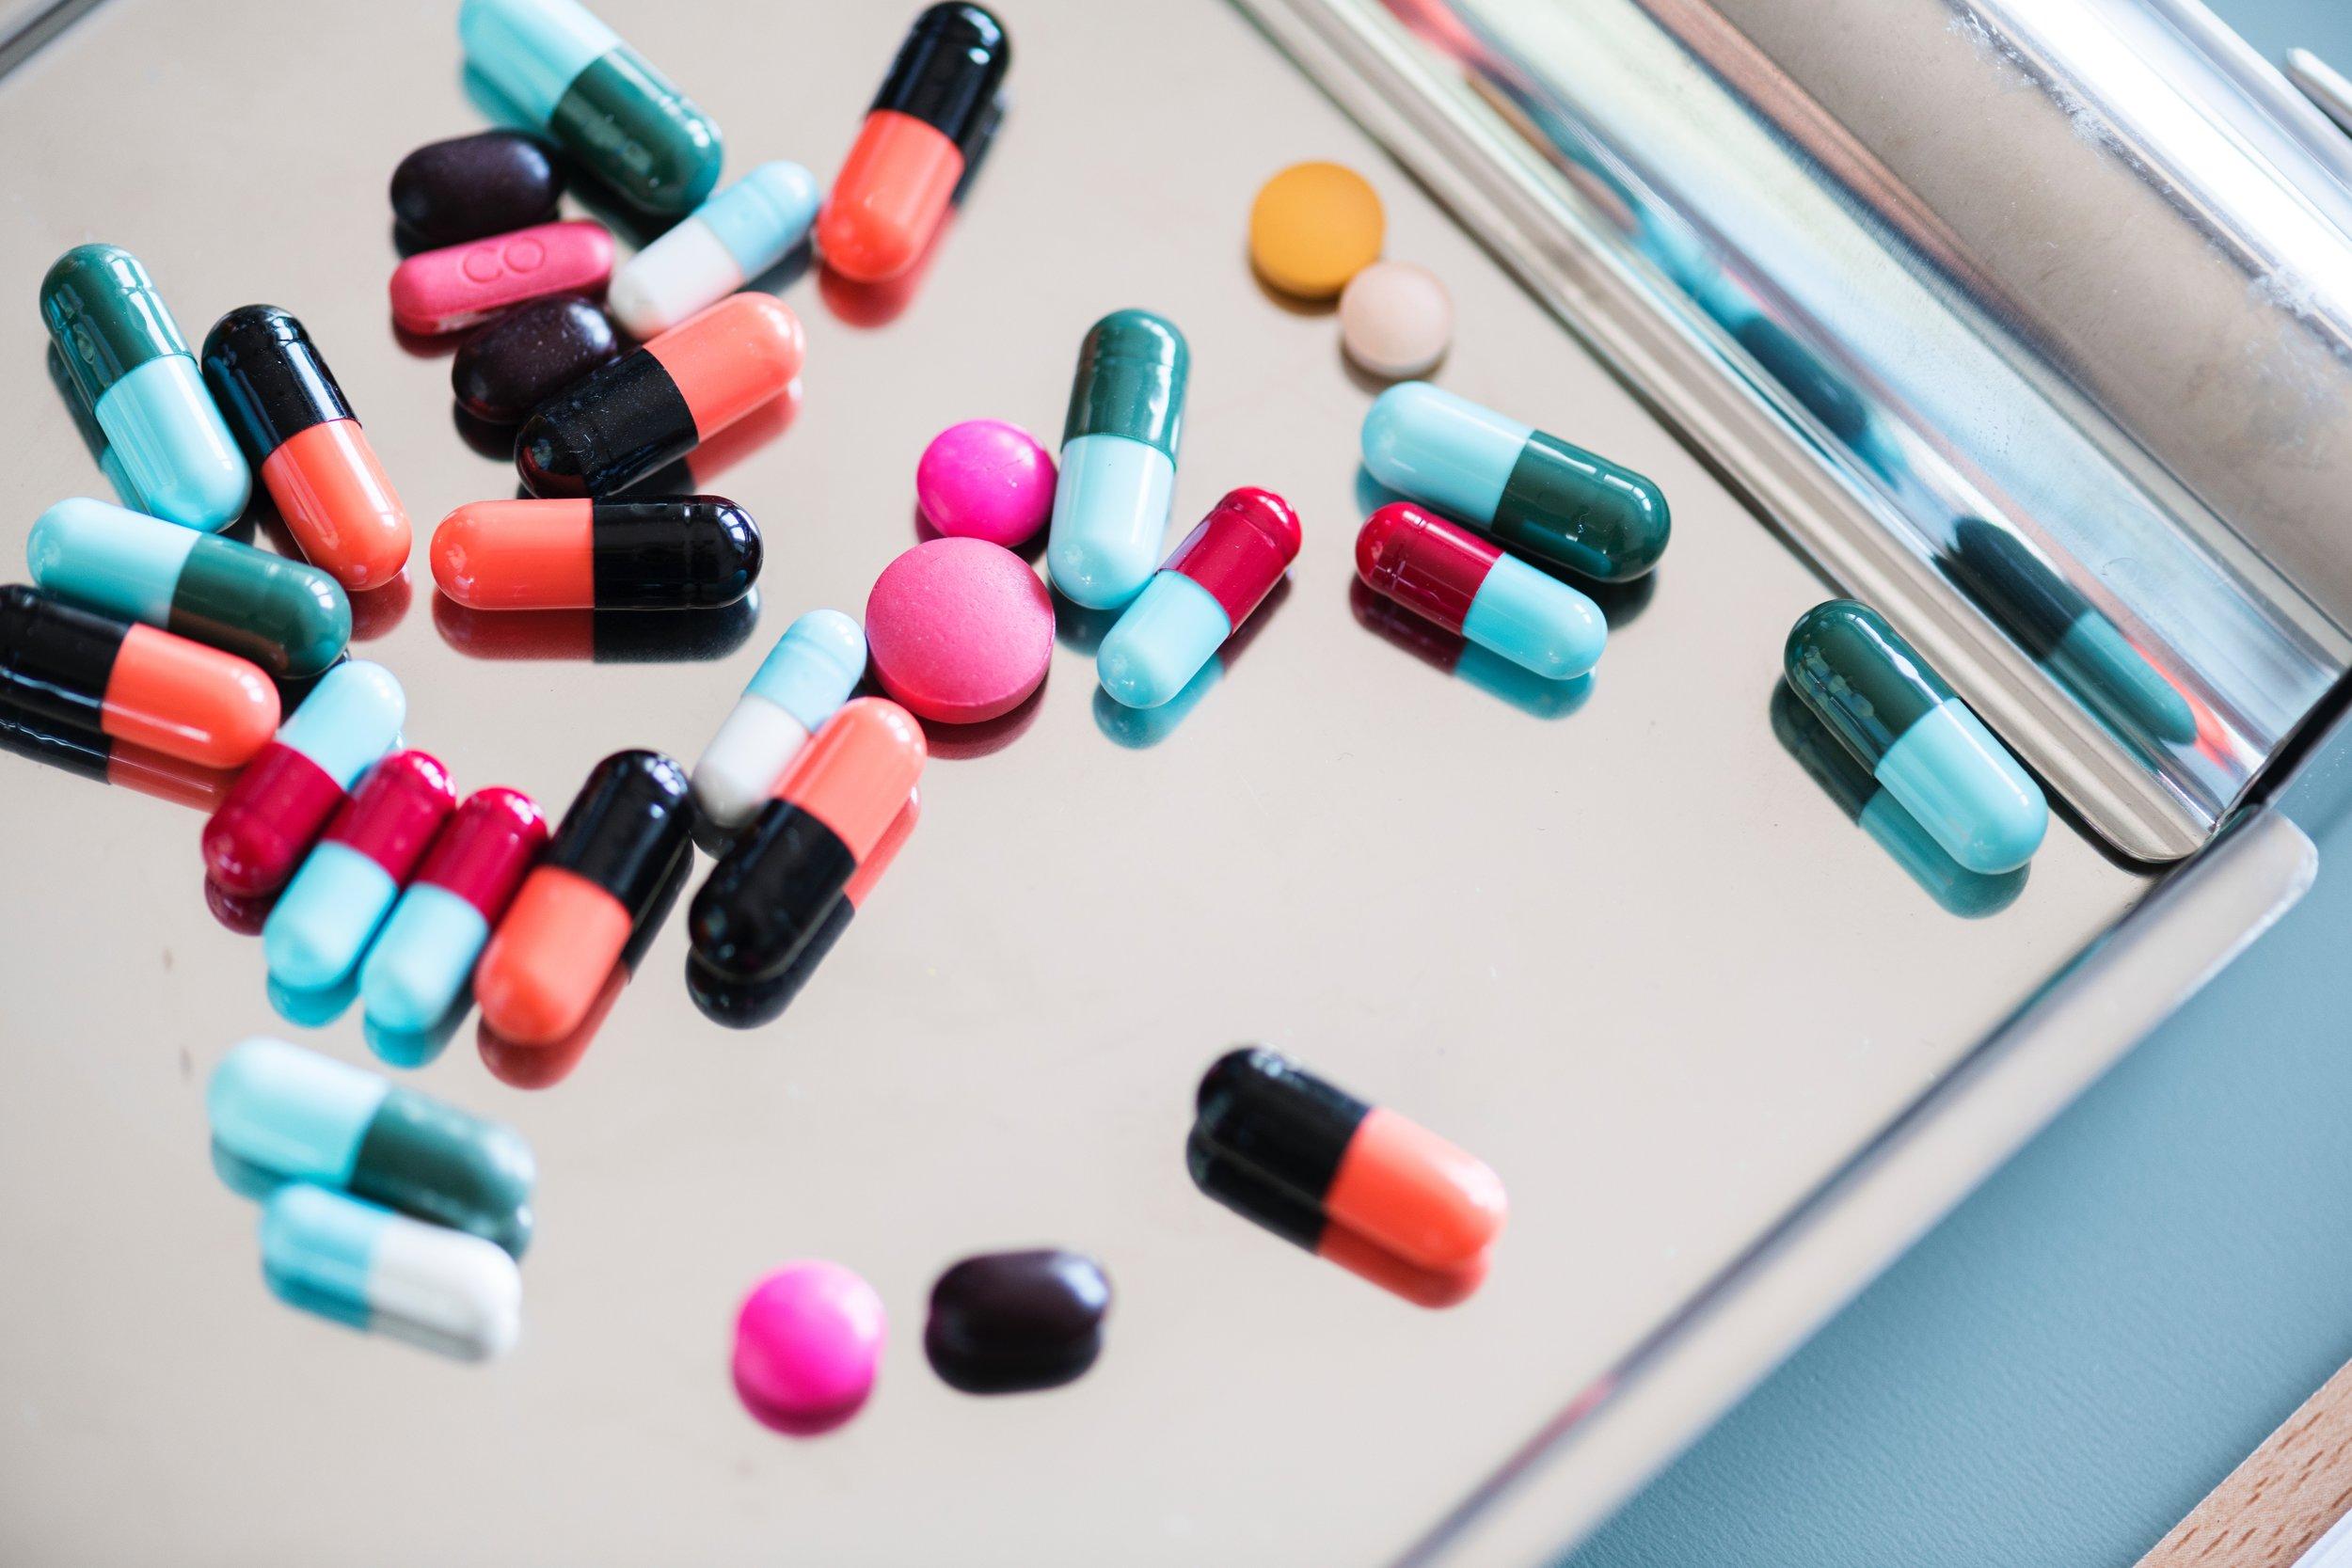 addiction-antibiotic-aspirin-860378.jpg